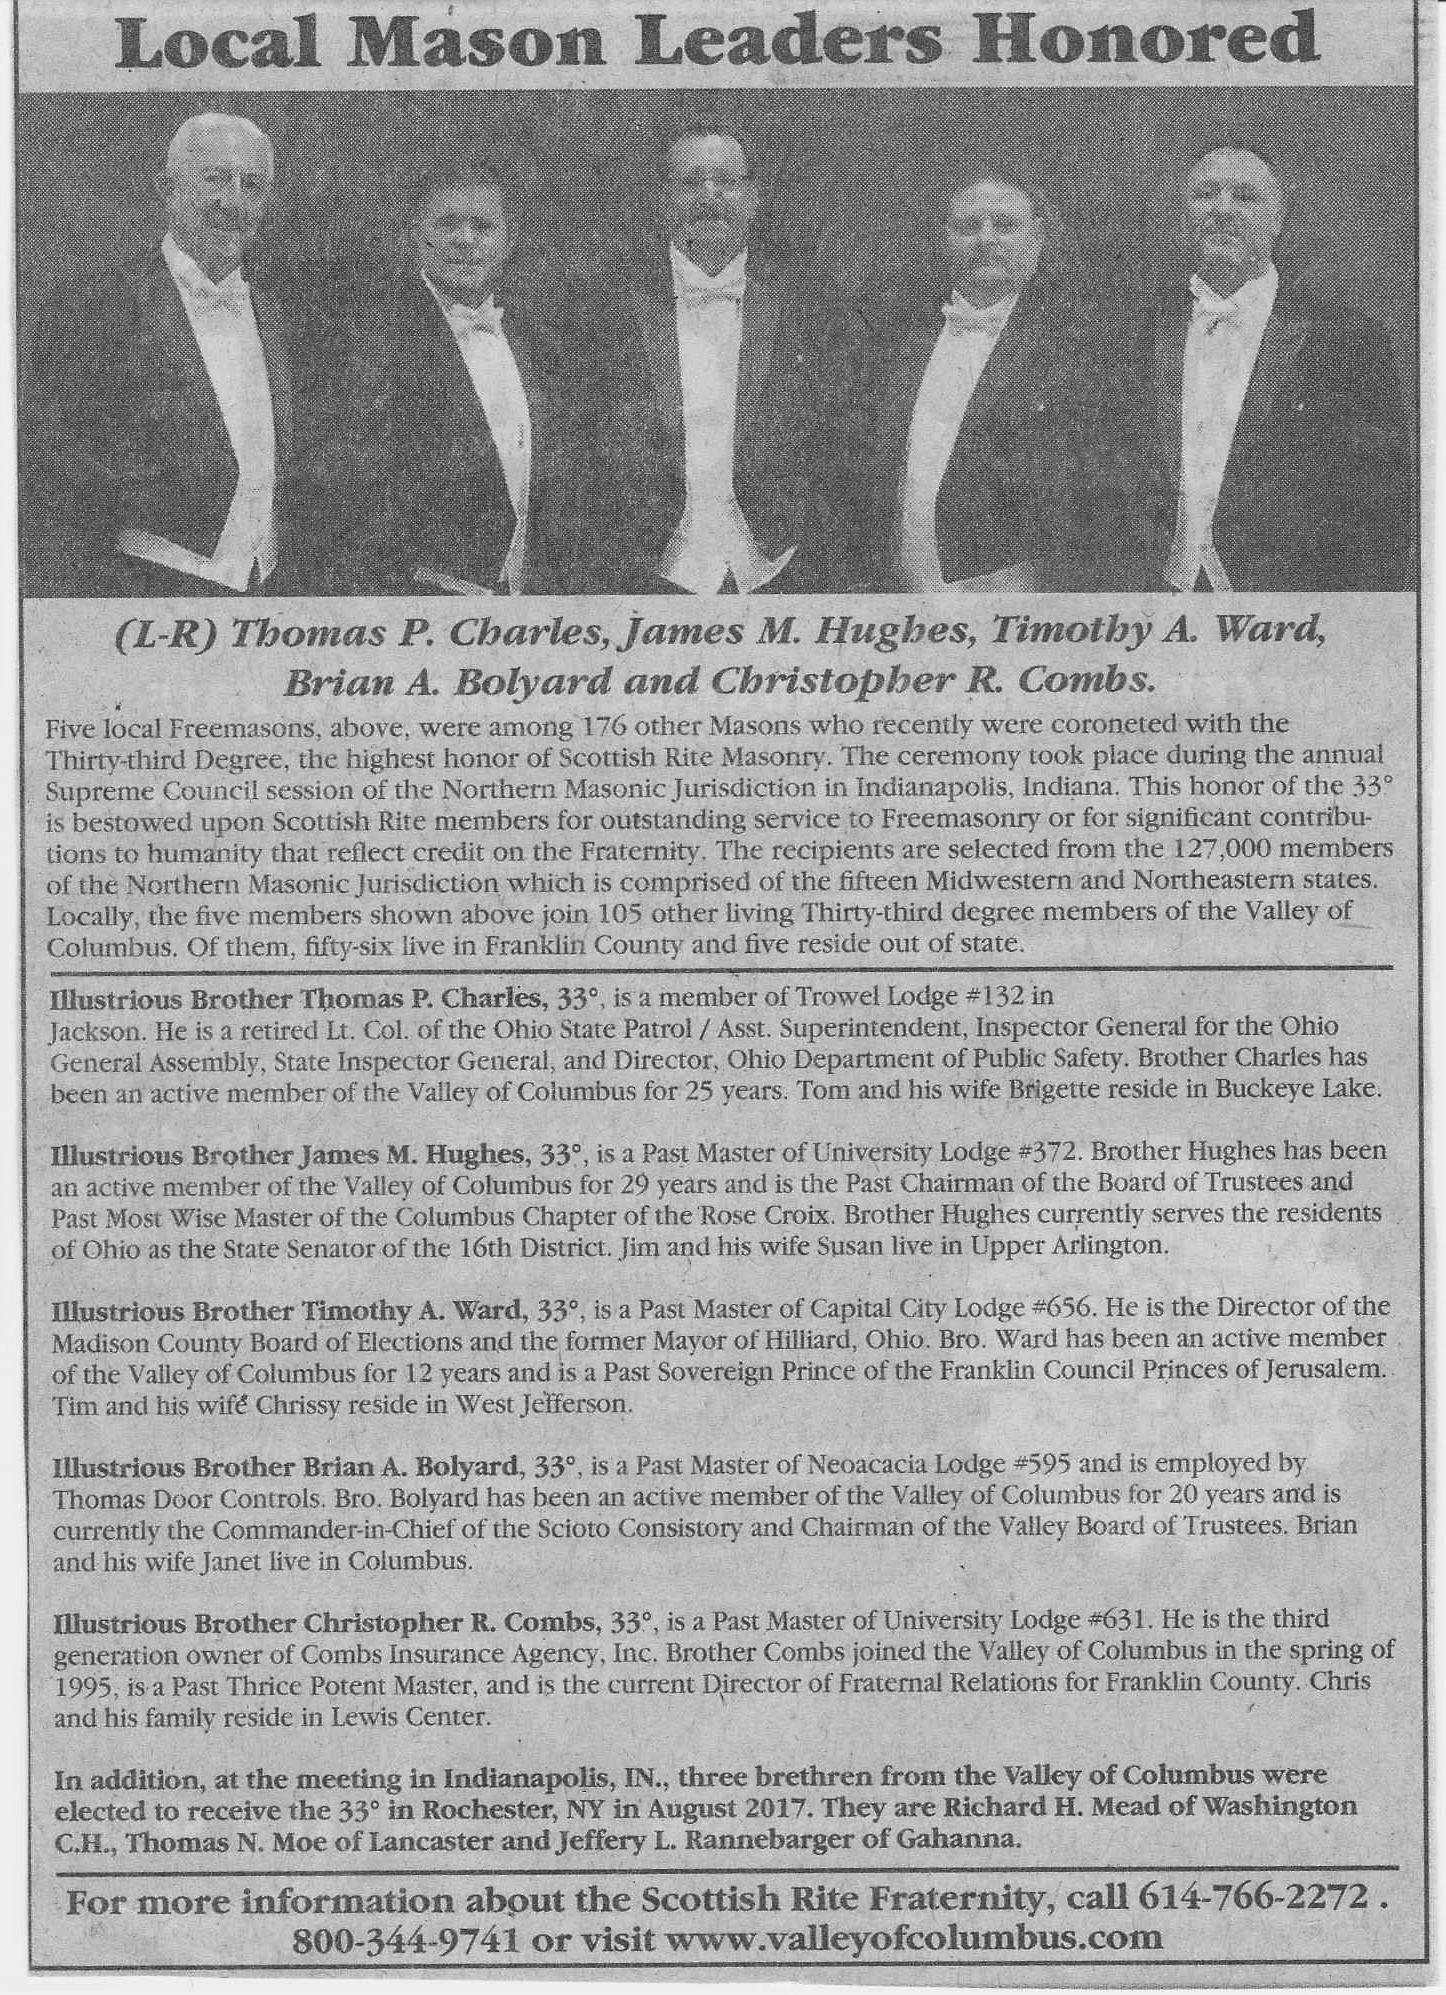 Local Scottish Rite Masons Receive 33rd Degree - Urania Lodge 311